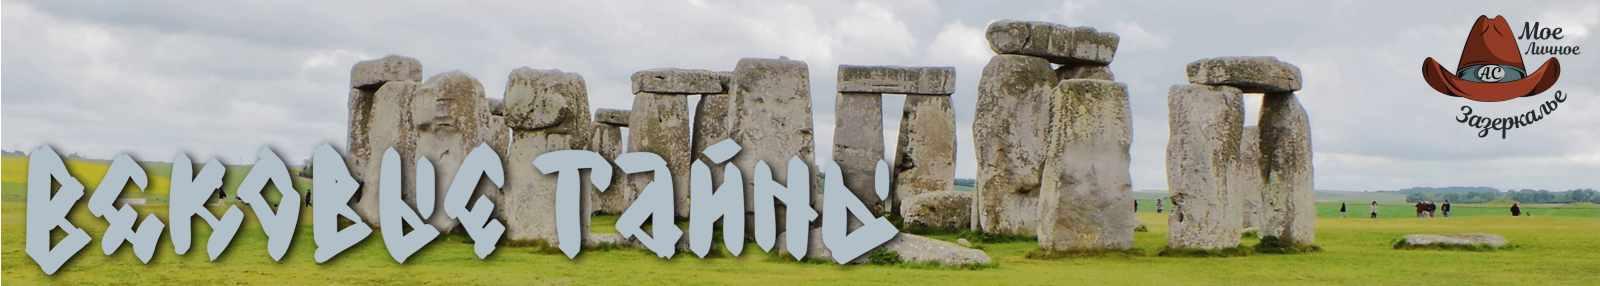 stonehandge-zazerkalie.jpg